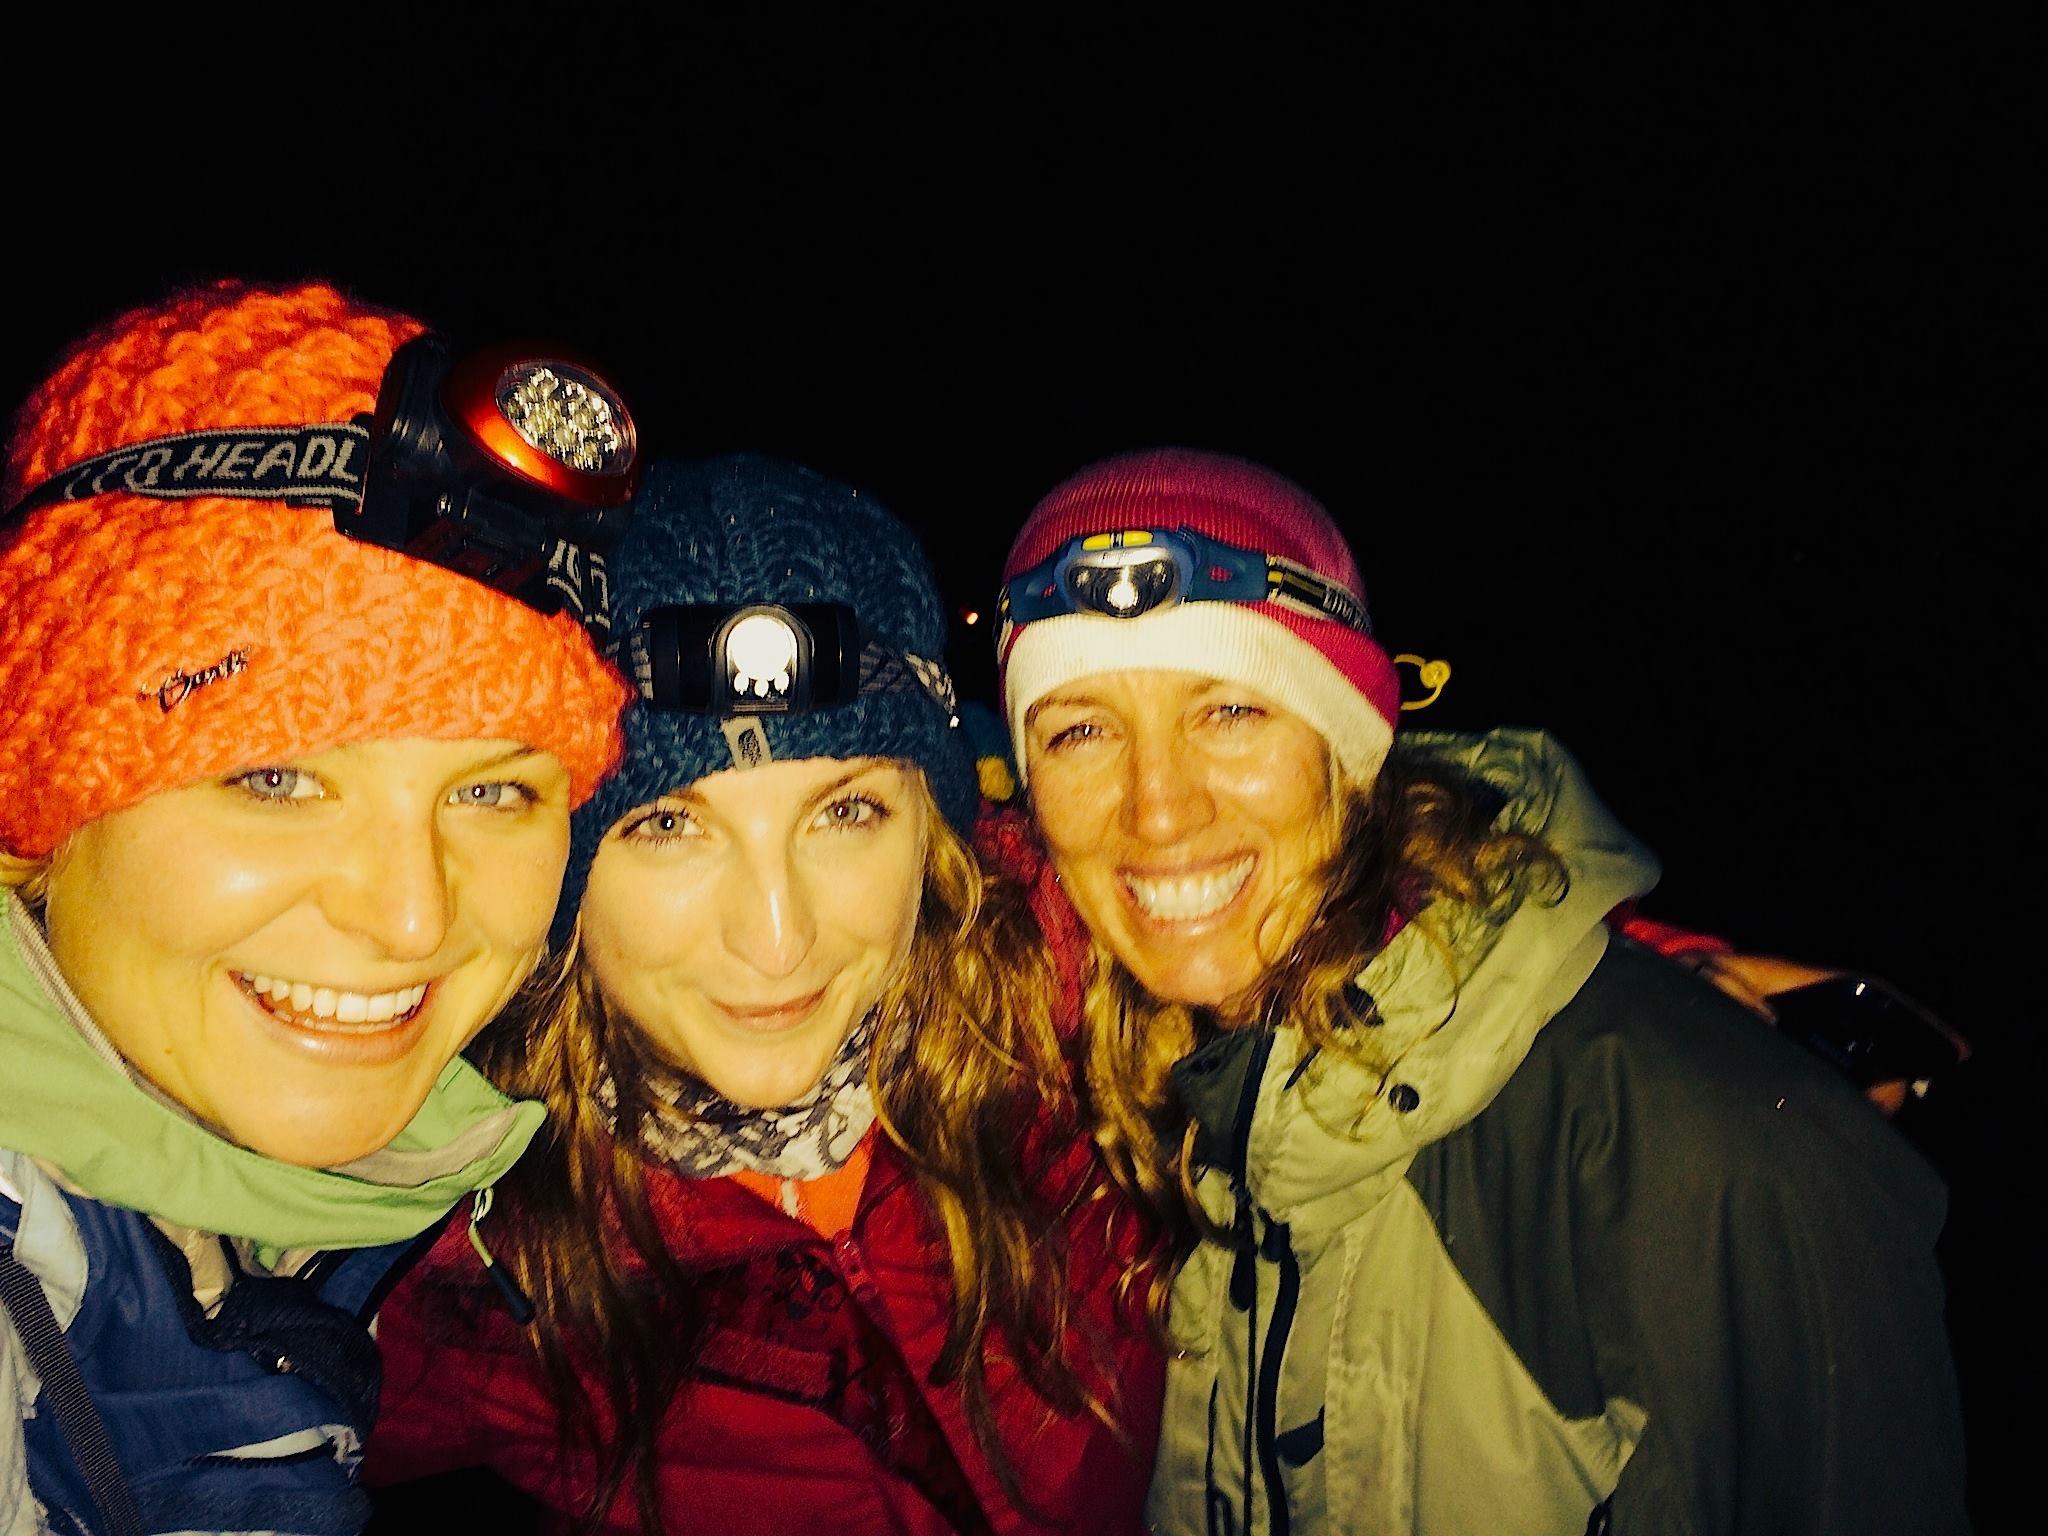 Bonfire night microadventure w peta Mcsharry and laura kennington.jpg